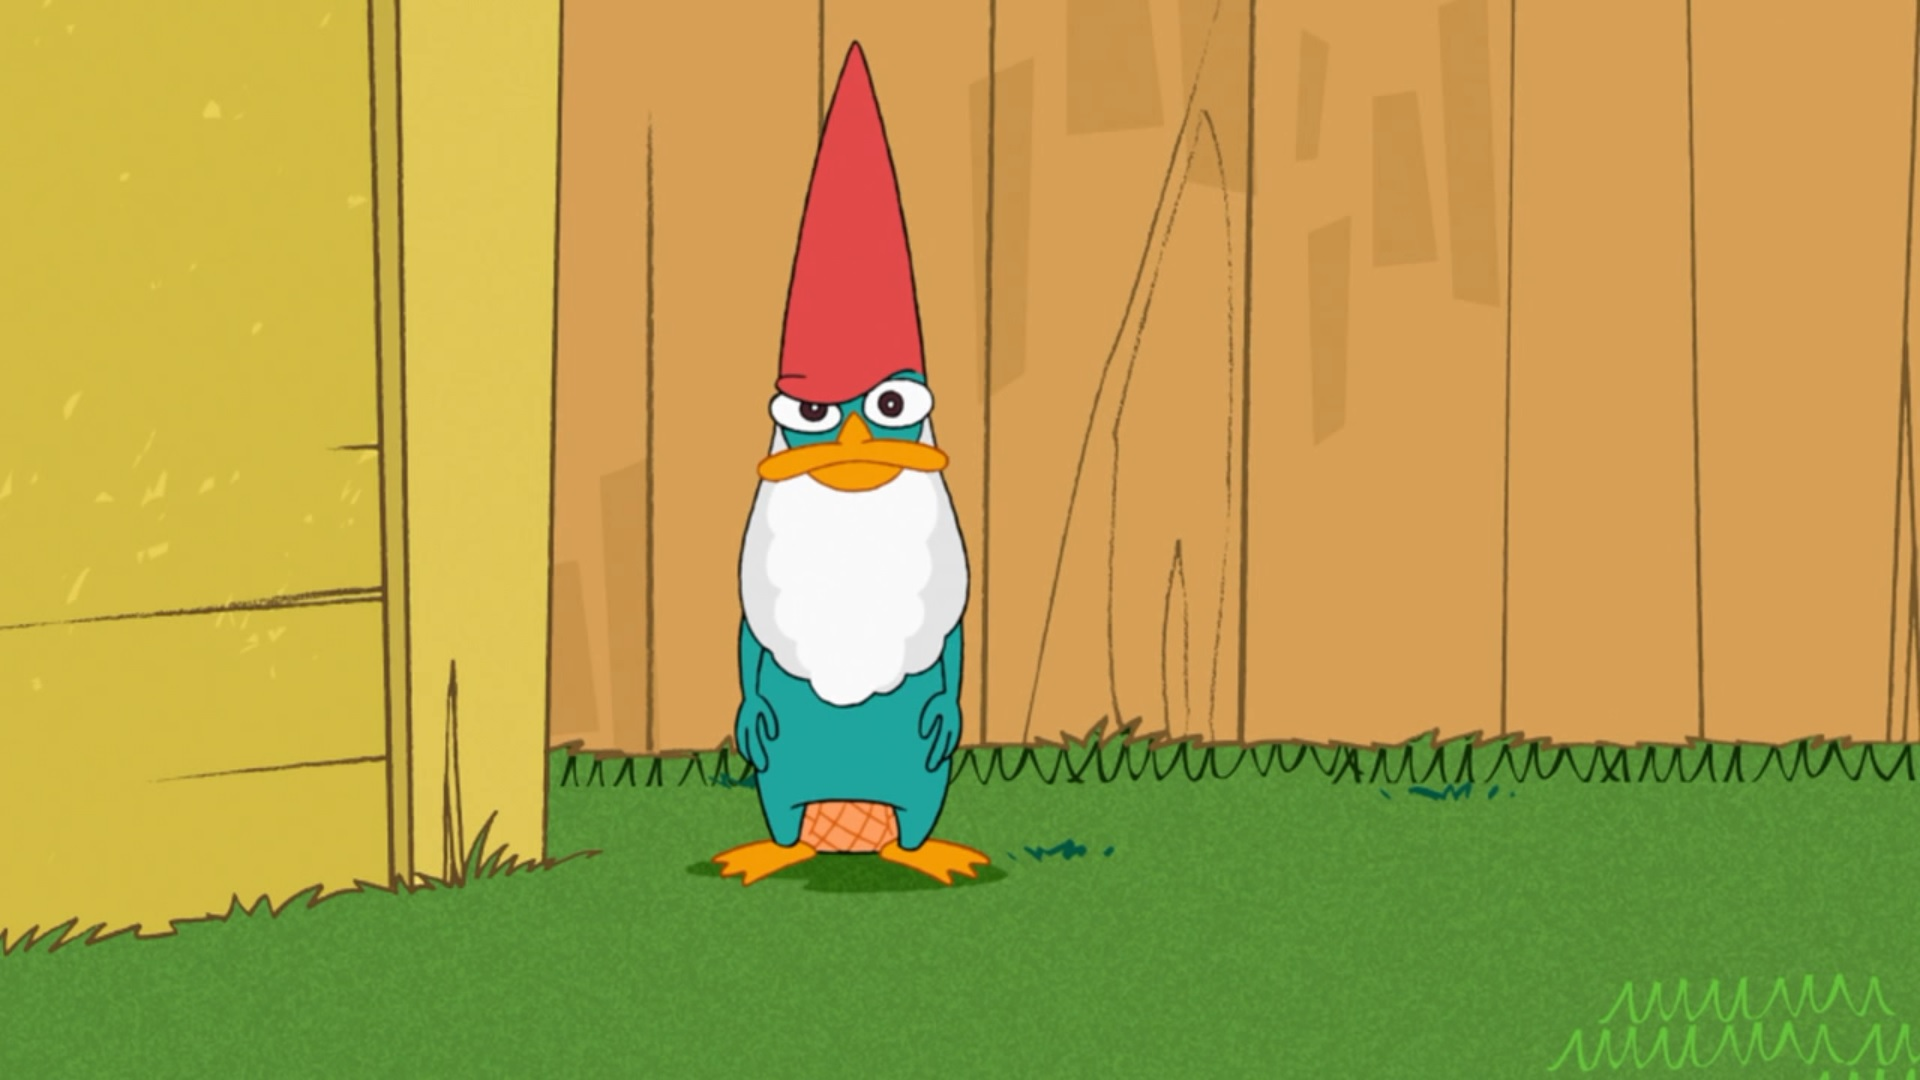 Tập tin:Perry as a lawn gnome.jpg